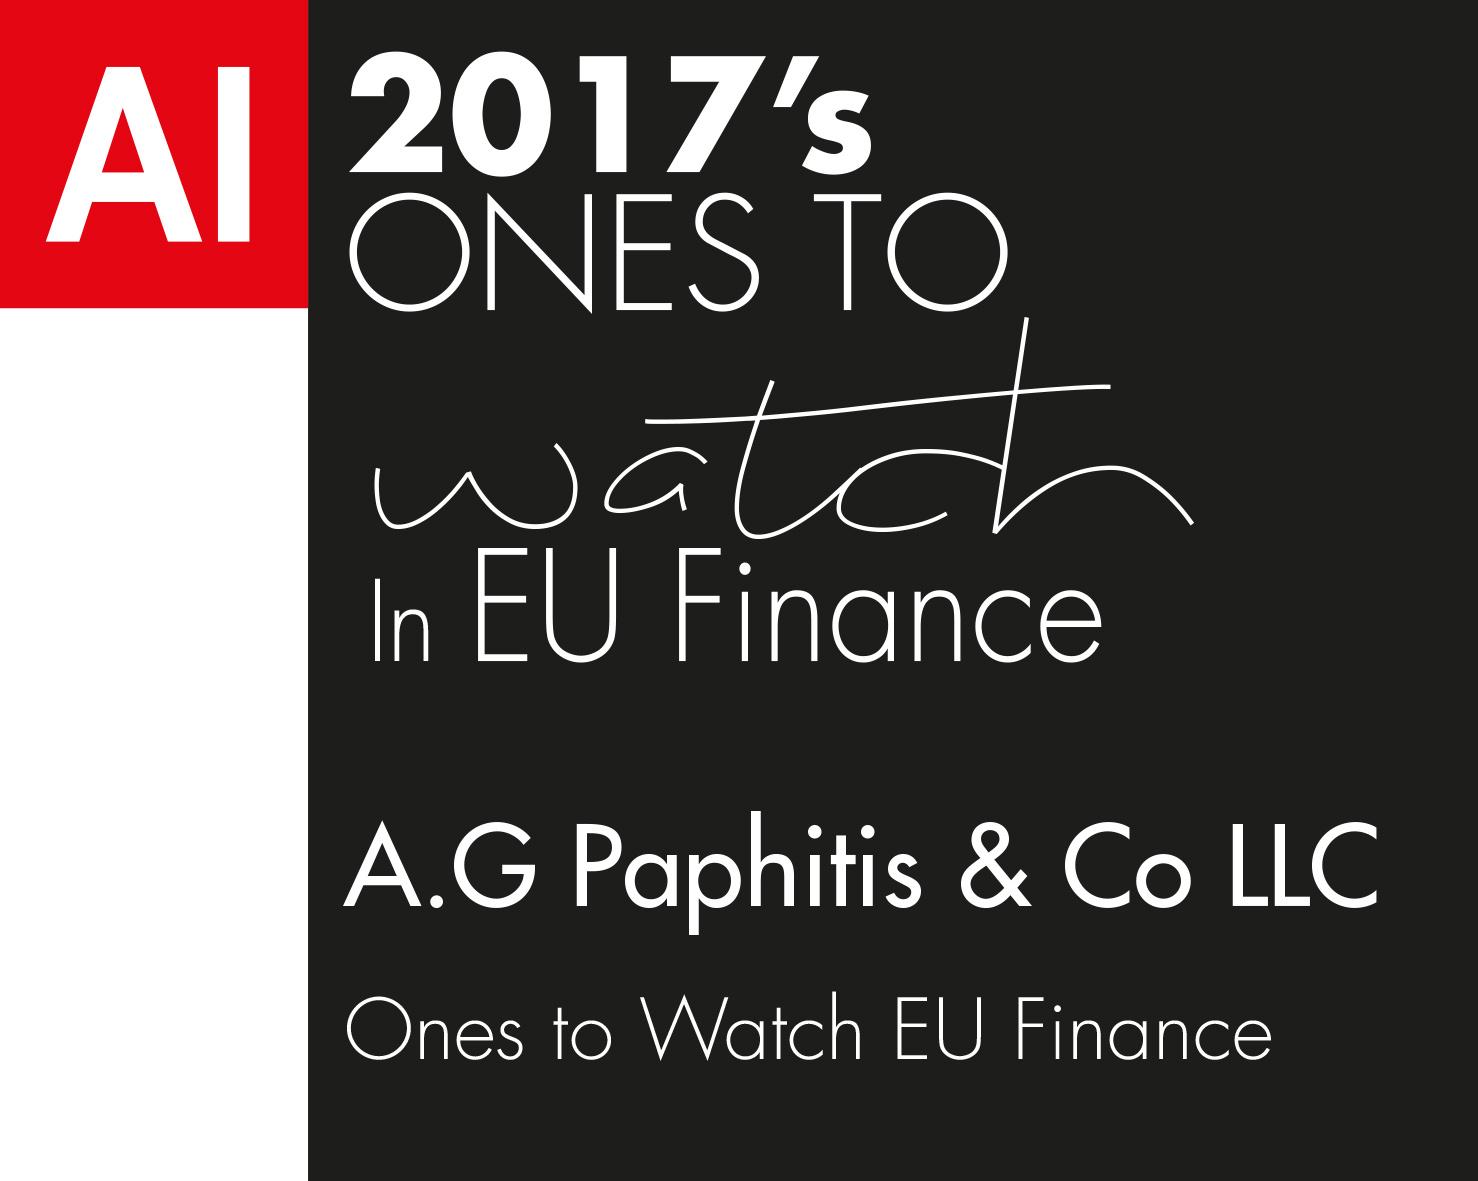 AI Ones to Watch EU Finance